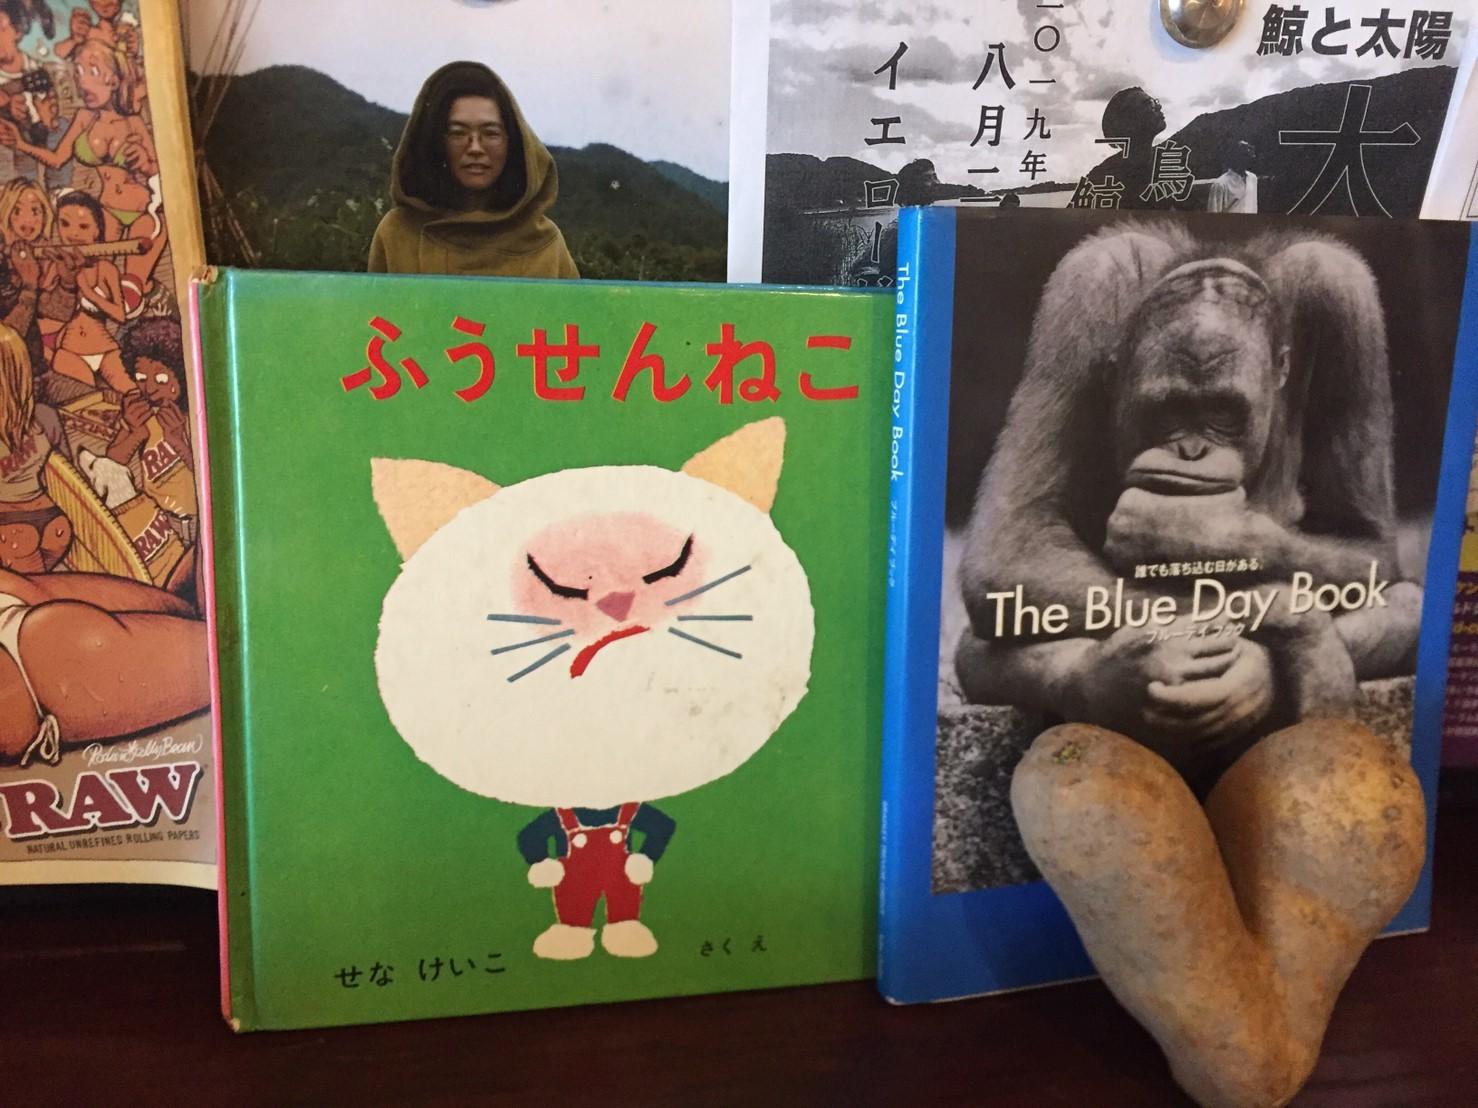 Vineria 農楽ttoria 山猫軒  荻ちゃんとランチ_e0115904_05403636.jpg